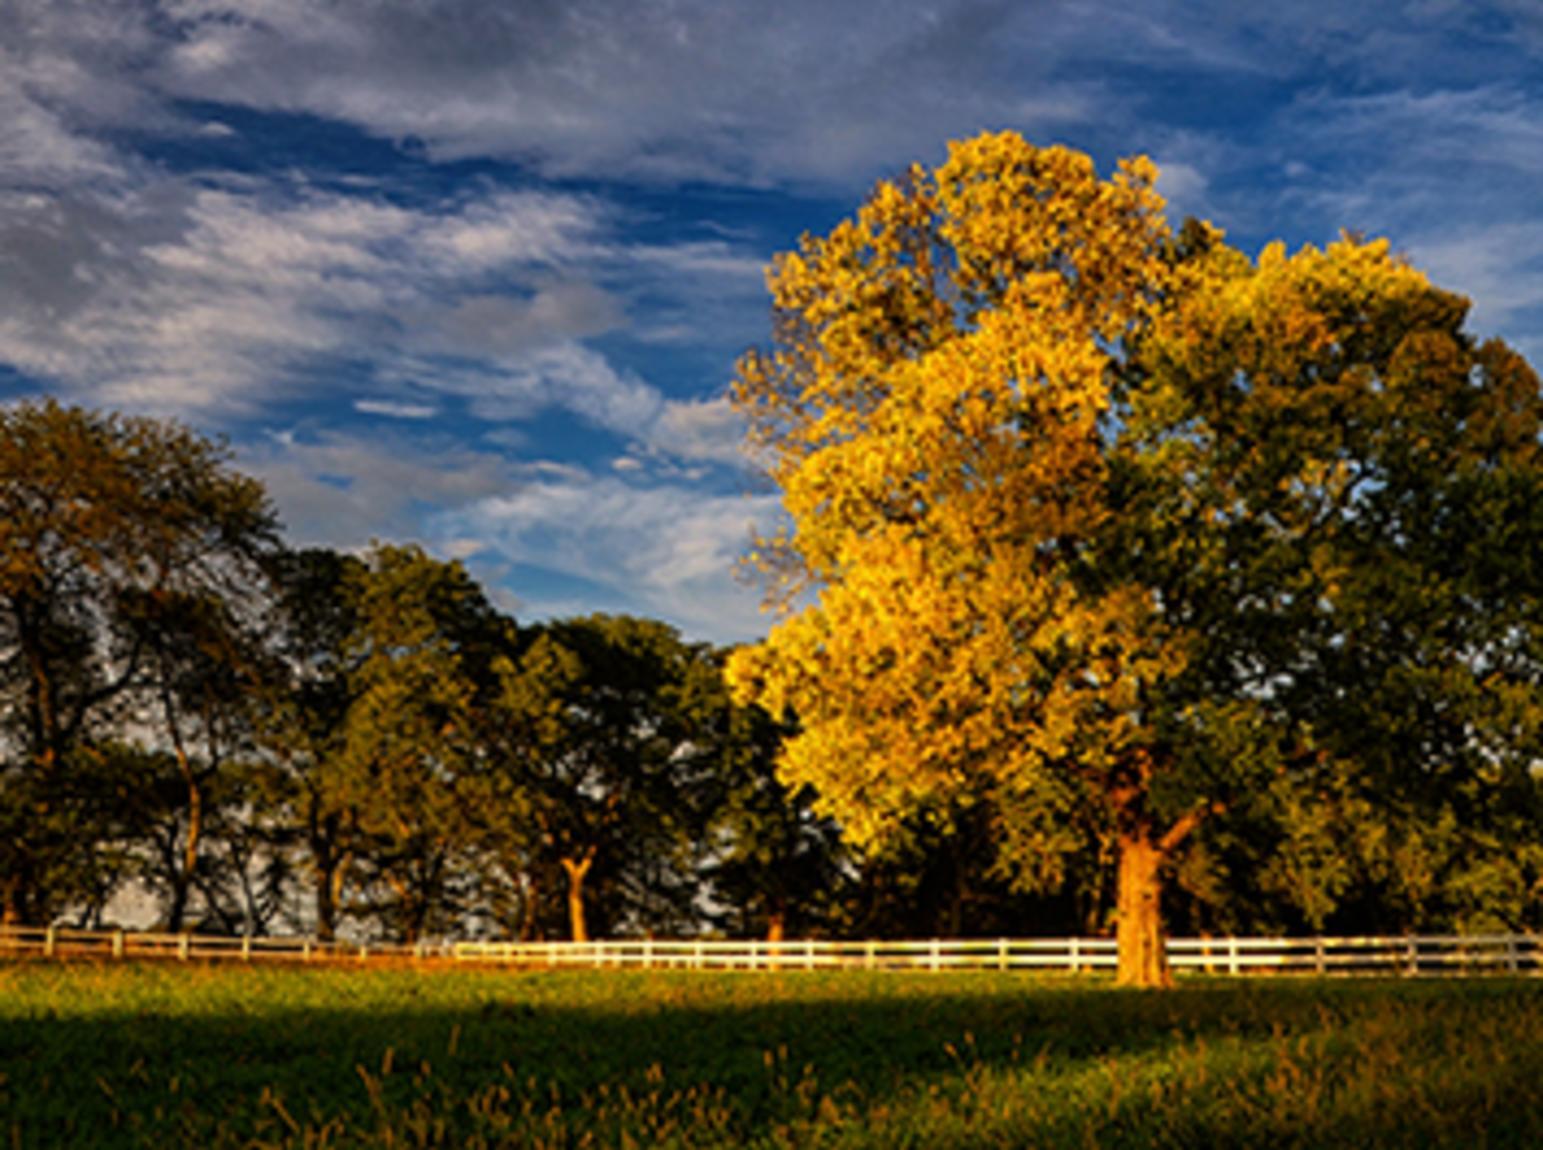 st-james-farm-fall-in-foal-form-carlton-holls-485x265.jpg